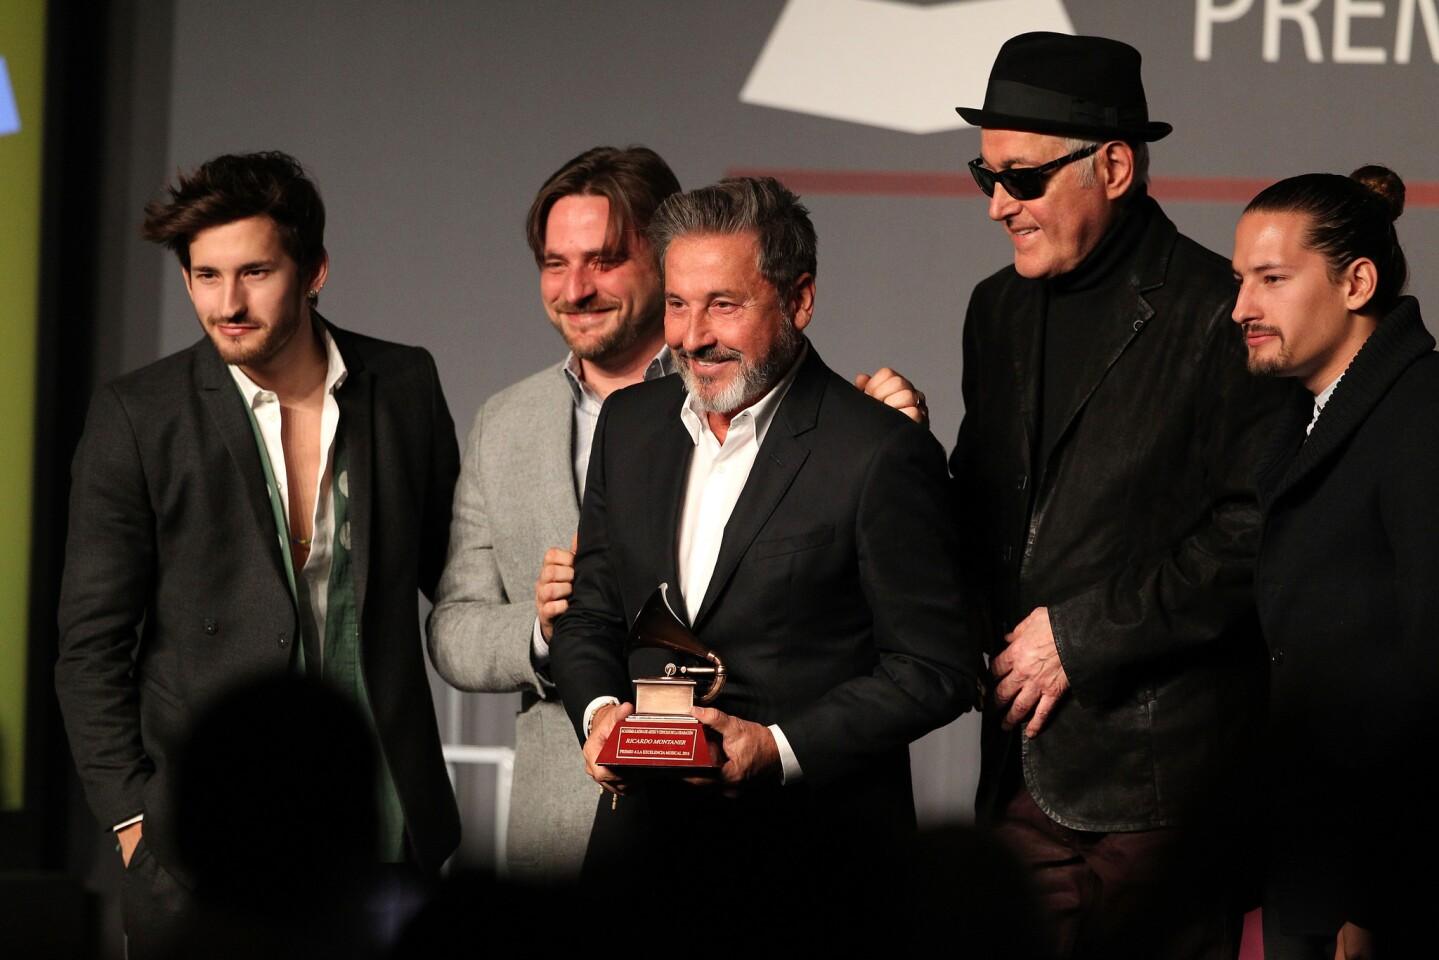 NV: The XVII Annual Latin Grammy Awards - Special Awards Ceremony